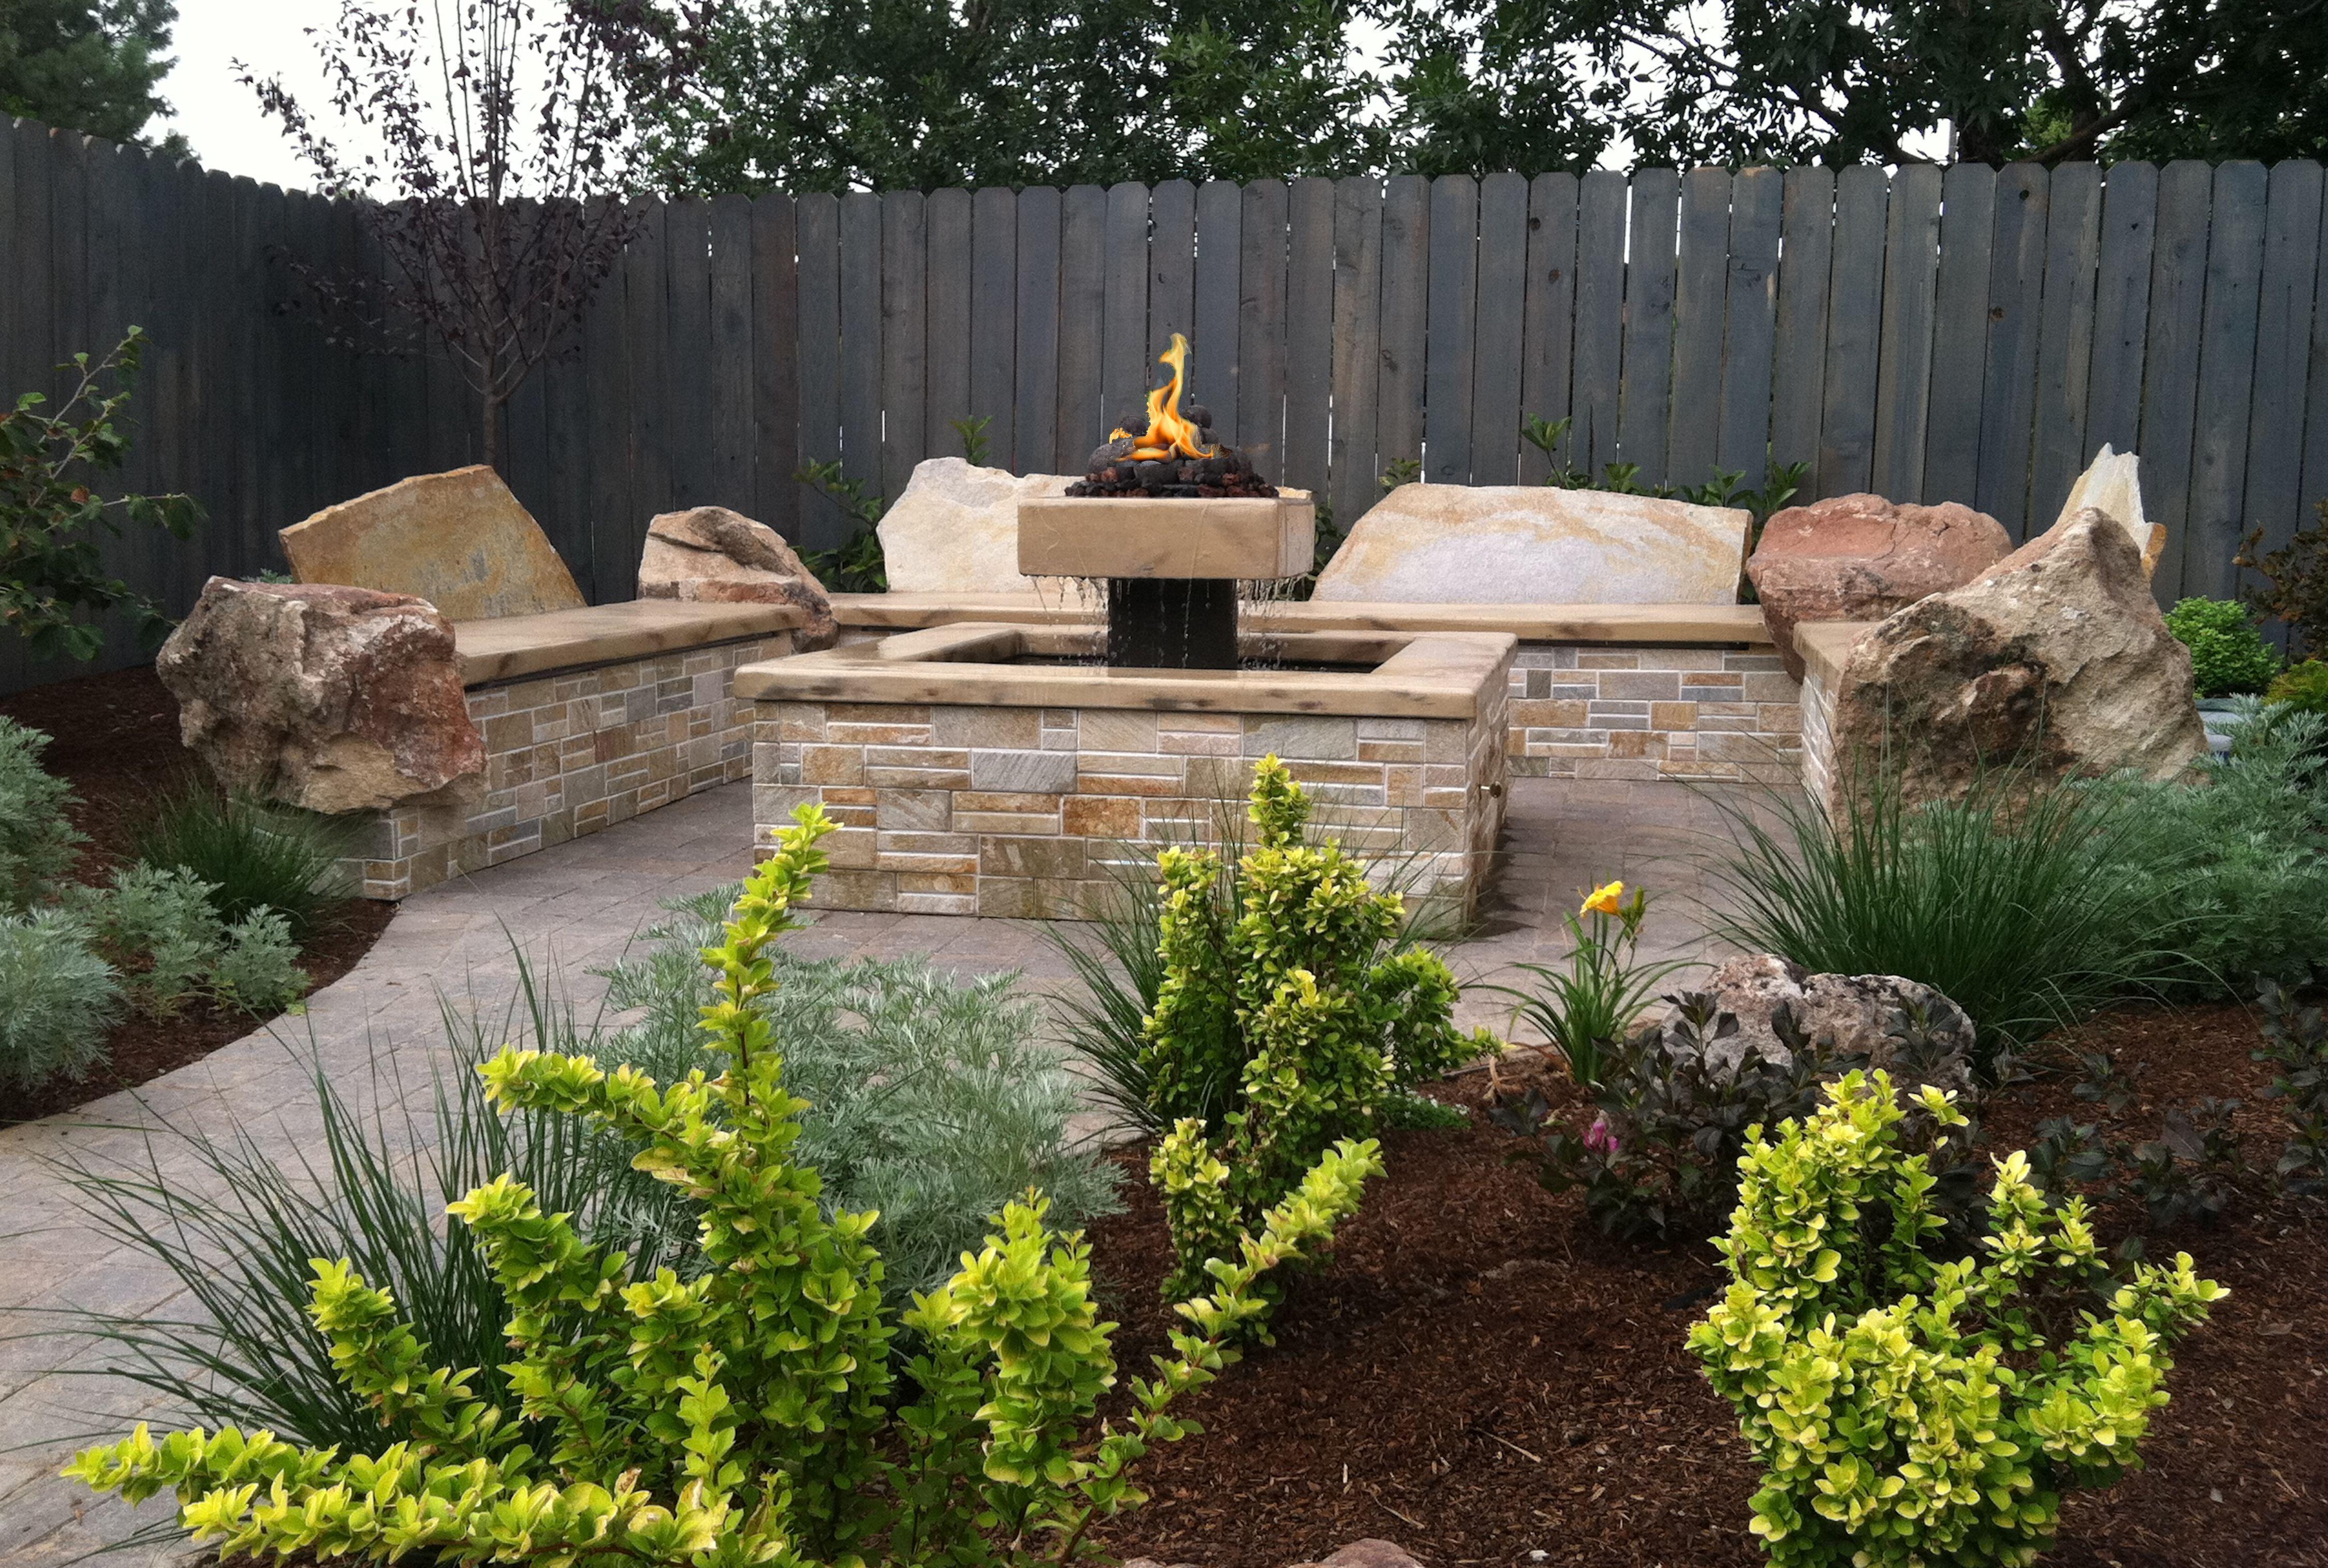 Boise Landscape Design And Build Garden Fire Pit Fire Pit Patio Small Backyard Design